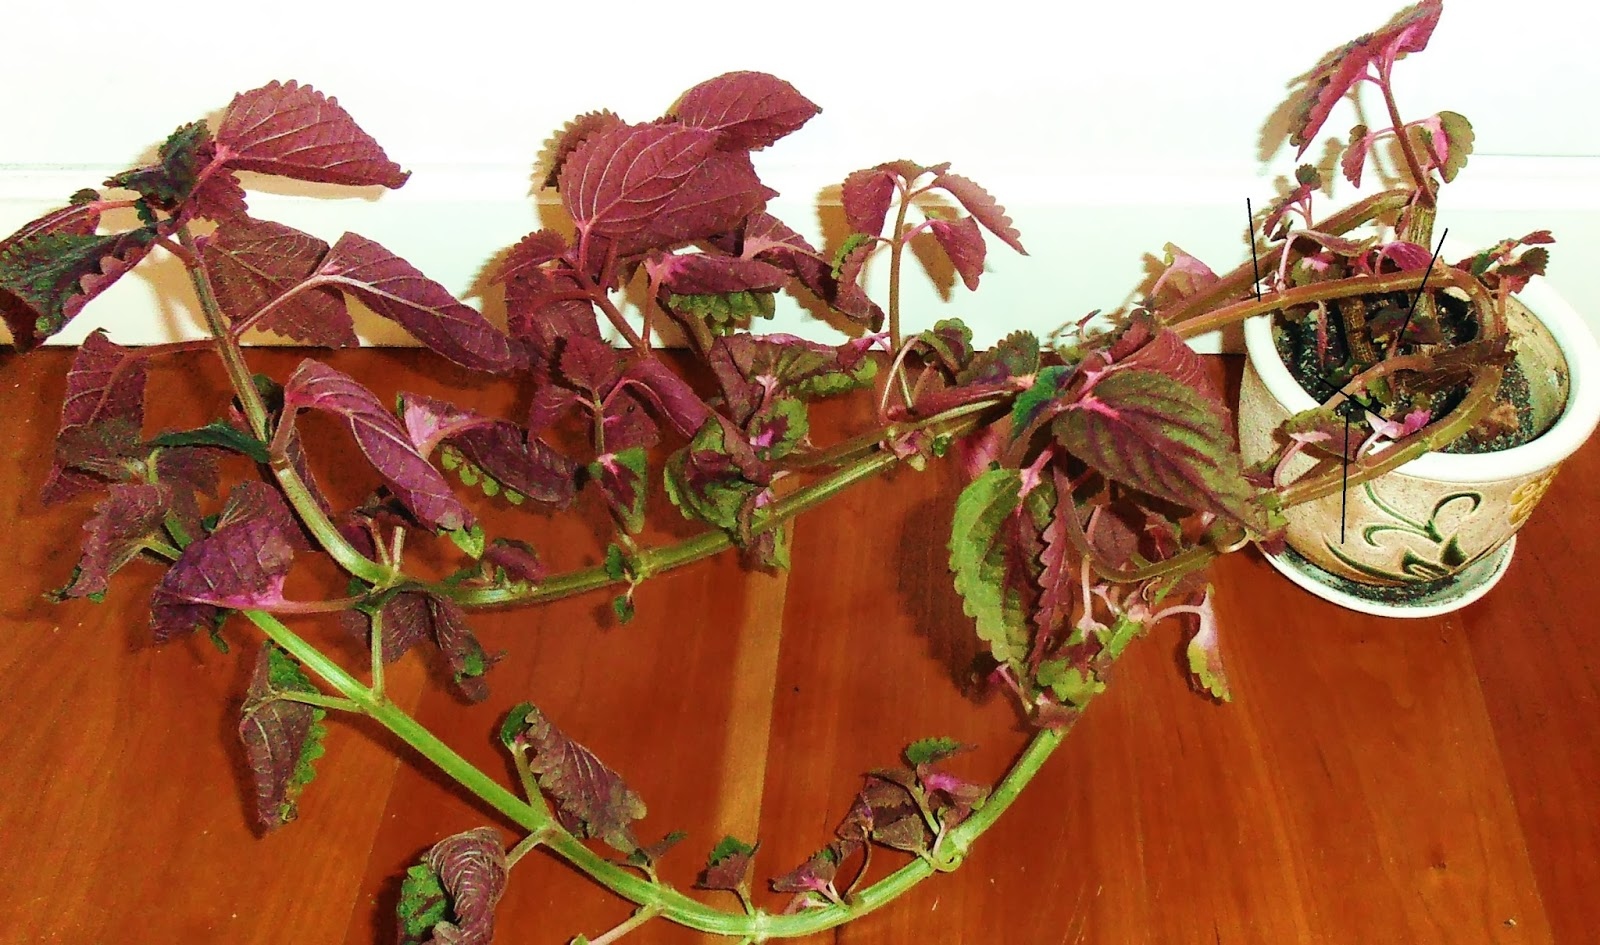 La ventana de javiruli plantas de interior 24 poda de - Plantas del interior ...